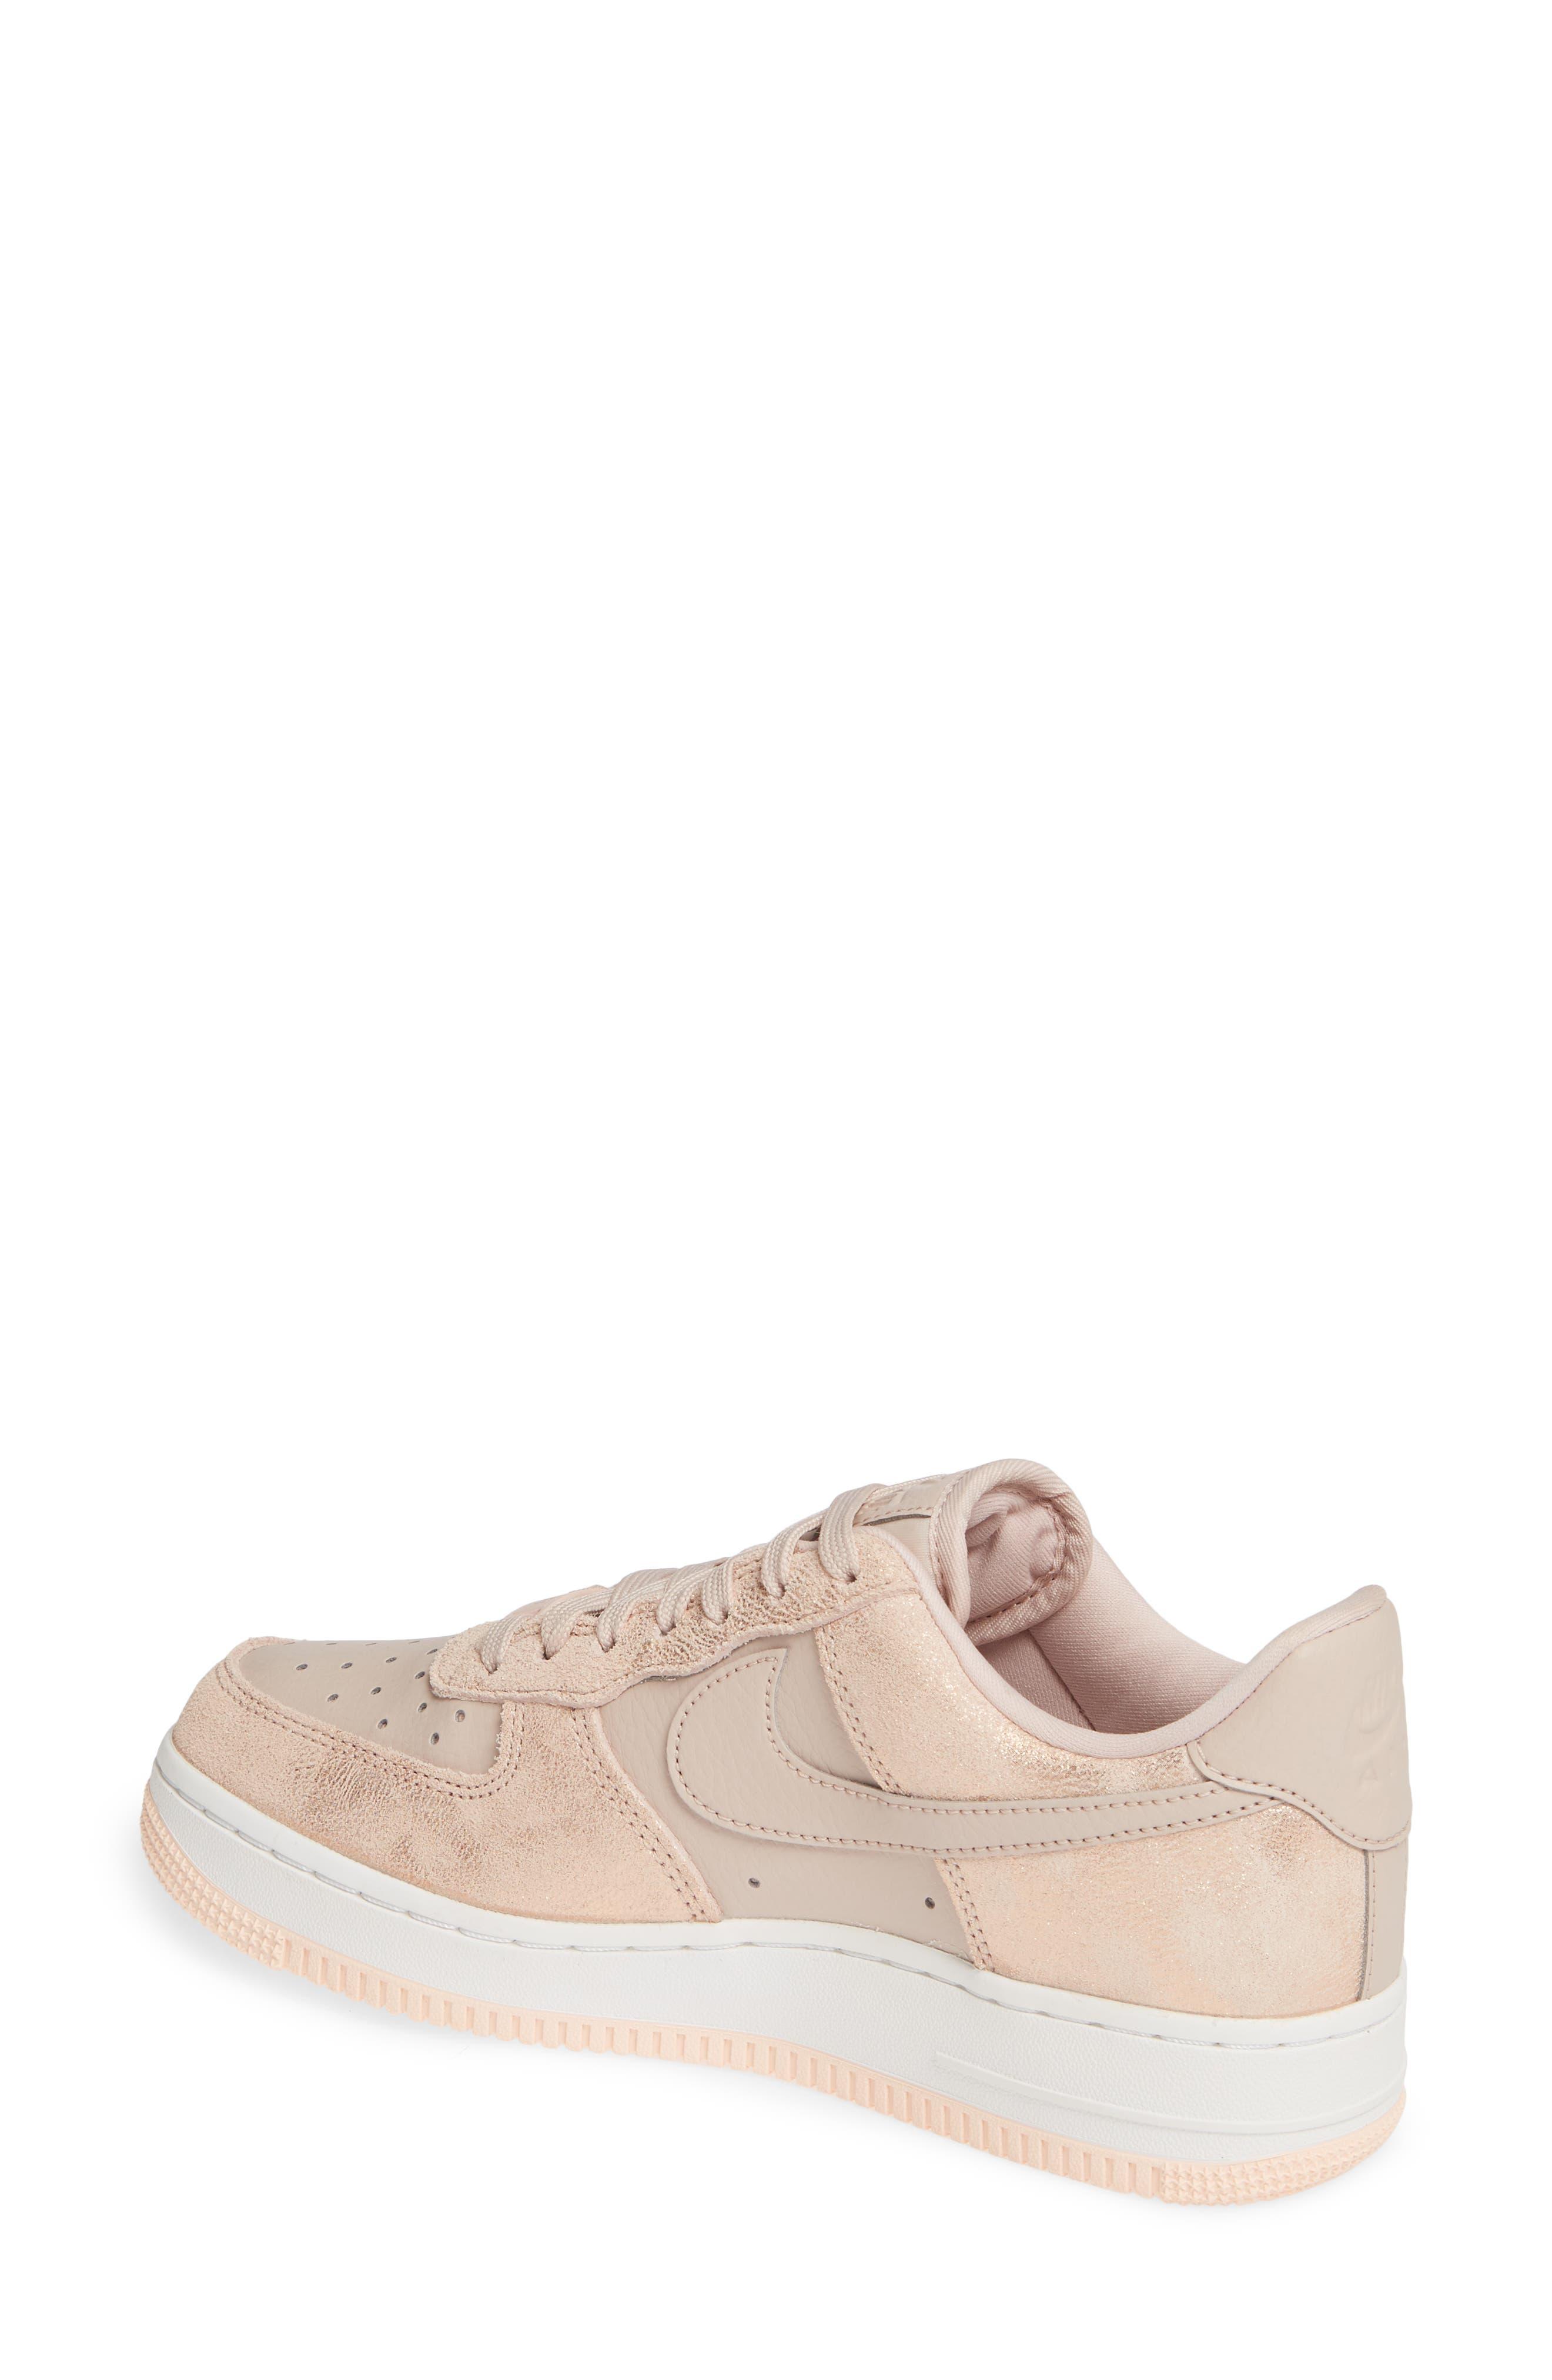 Air Force 1 '07 Premium Sneaker,                             Alternate thumbnail 2, color,                             RED BRONZE/ PARTICLE BEIGE